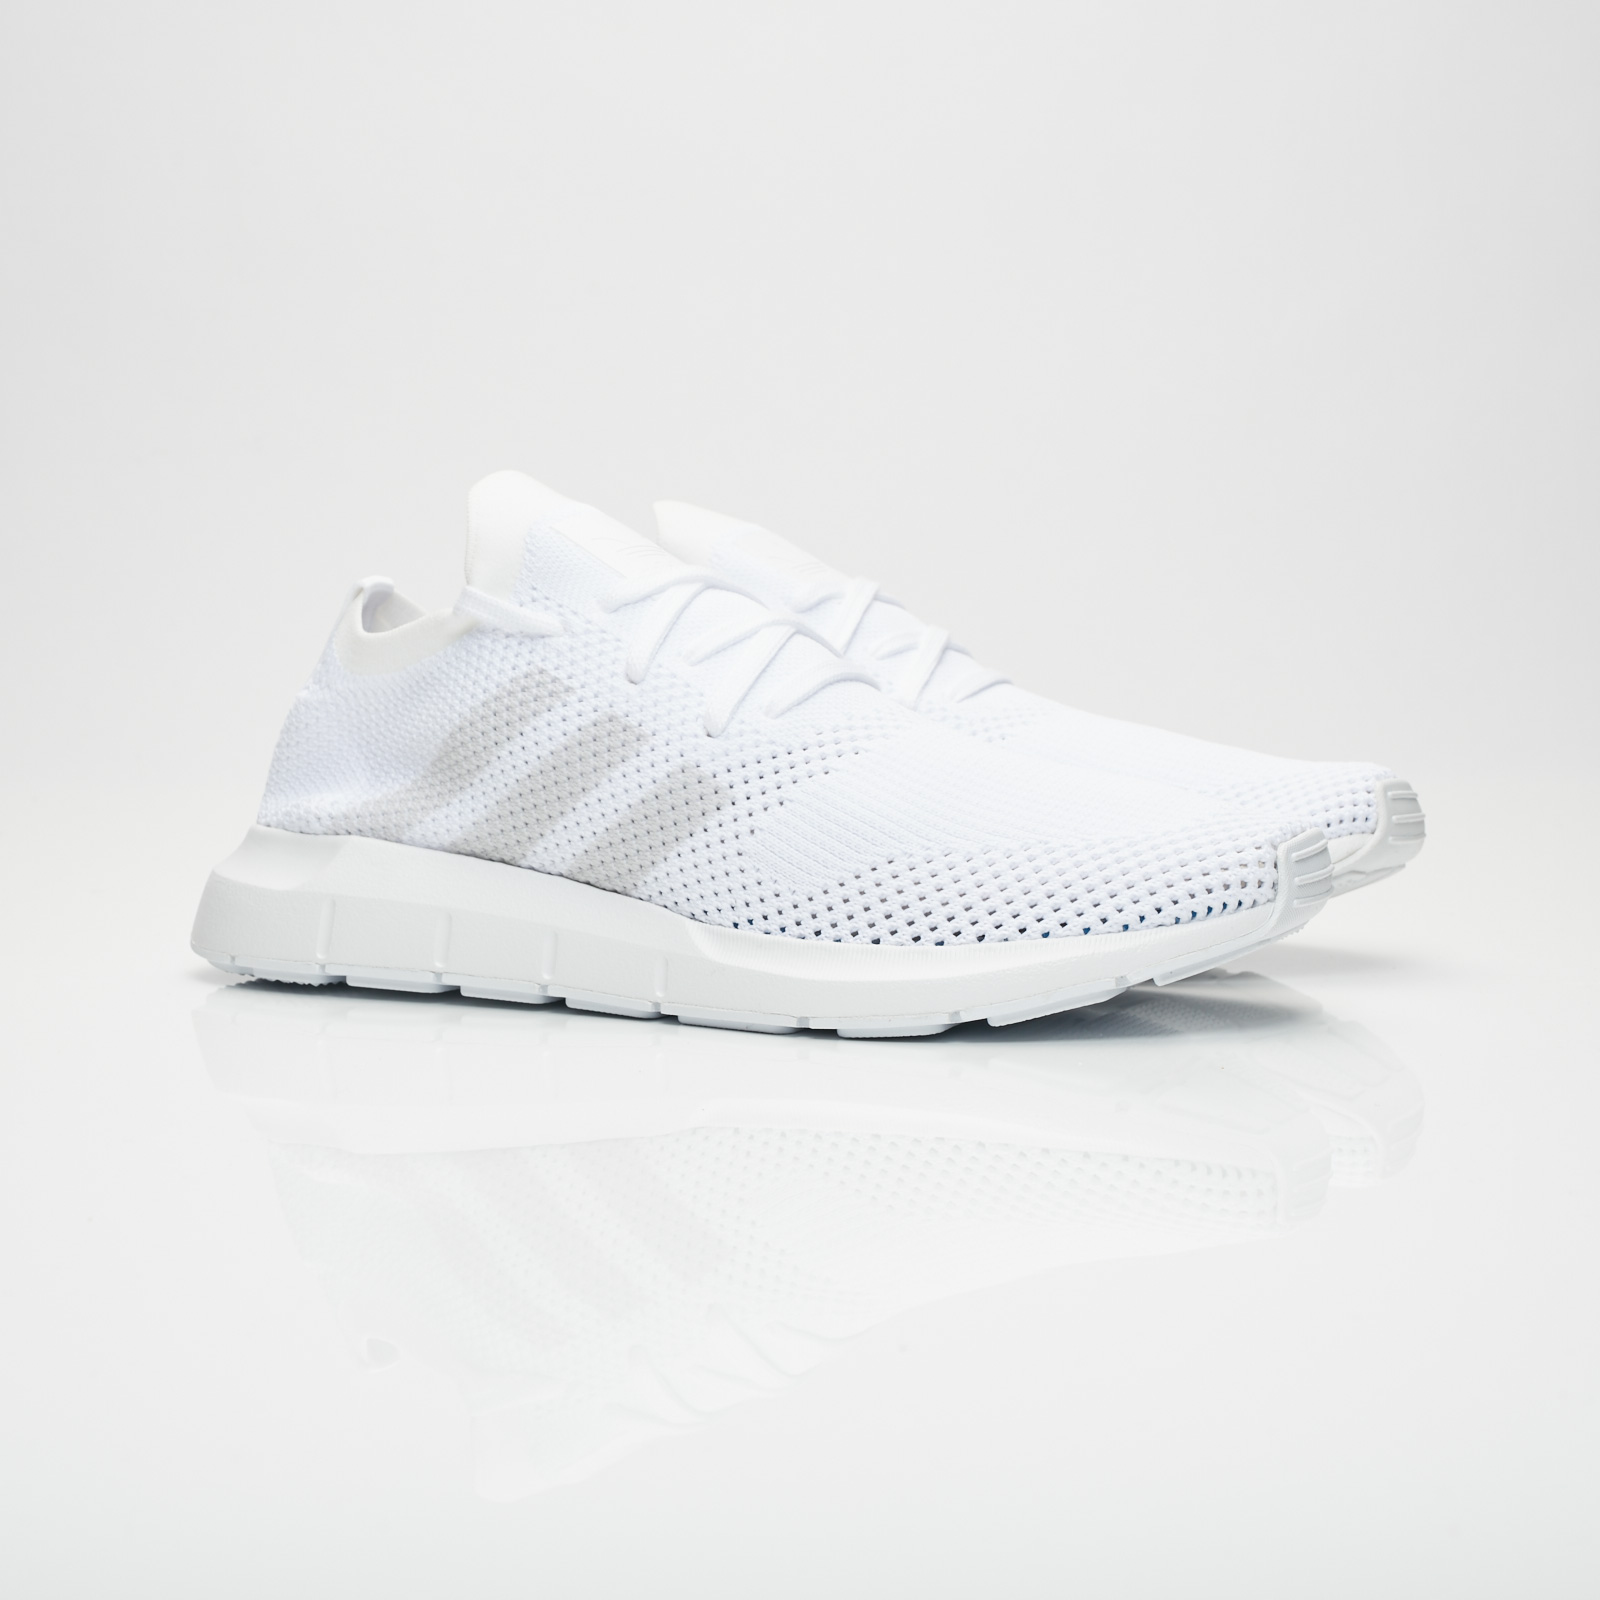 adidas Swift Run PK Cq2892 Sneakersnstuff | sneakers